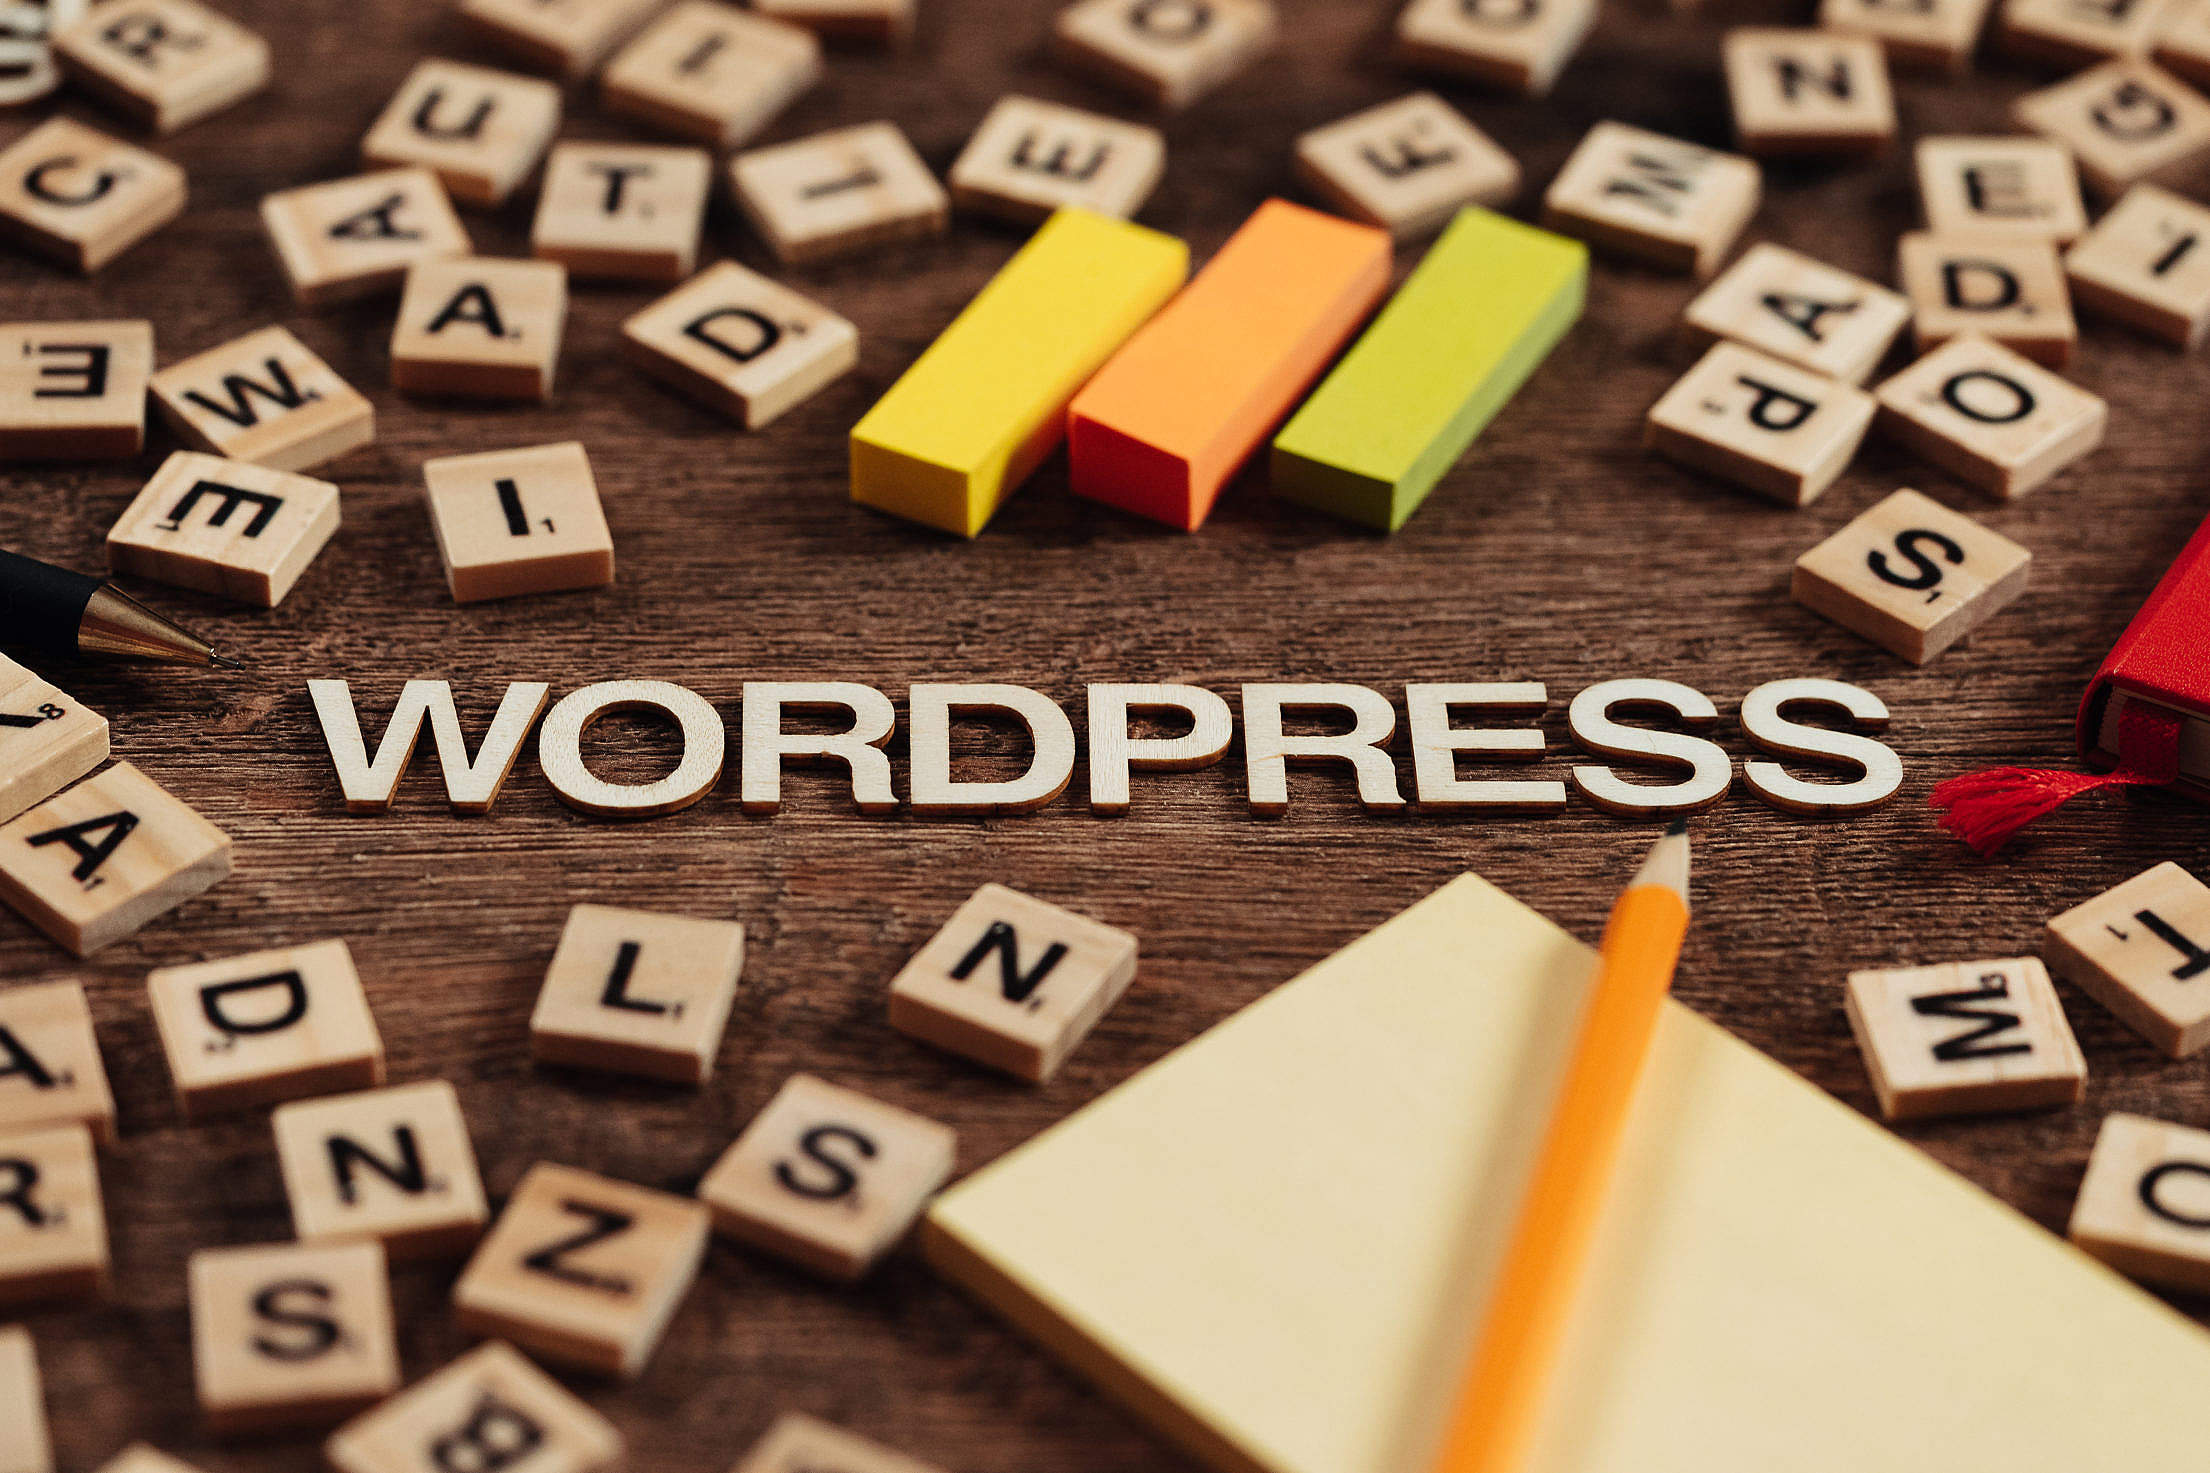 WordPress Free Stock Photo